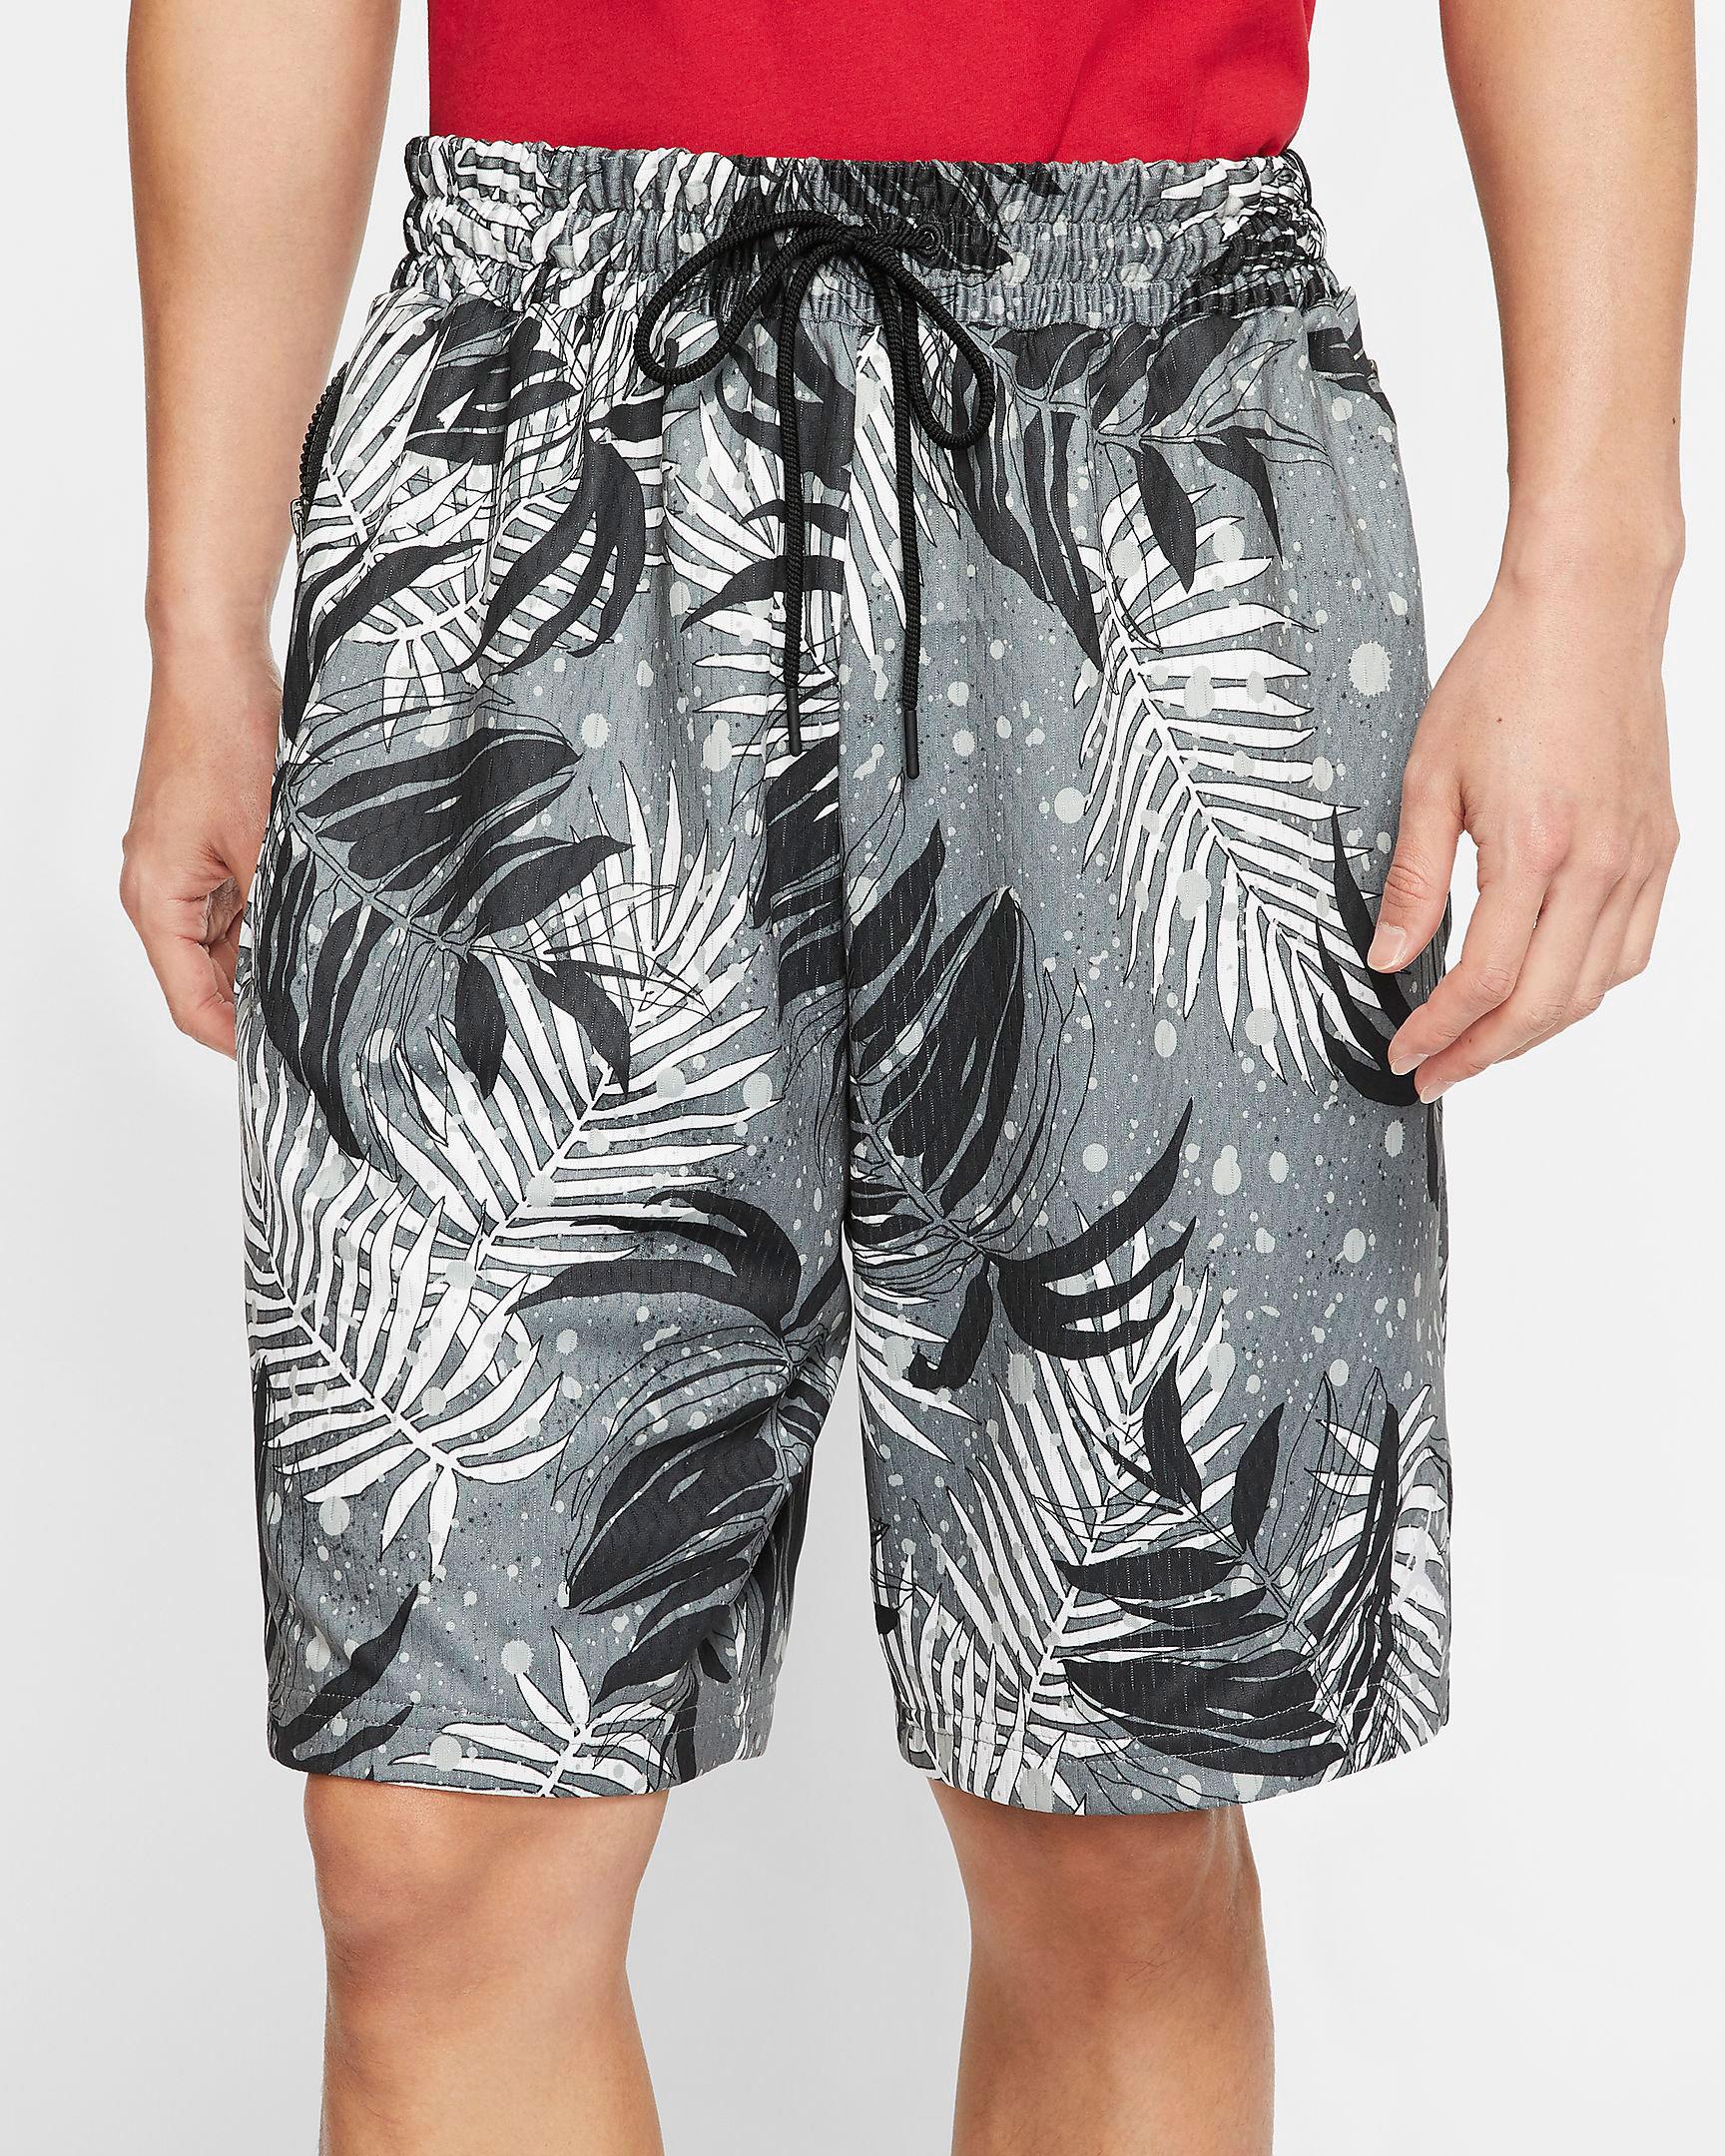 jordan-poolside-floral-shorts-black-grey